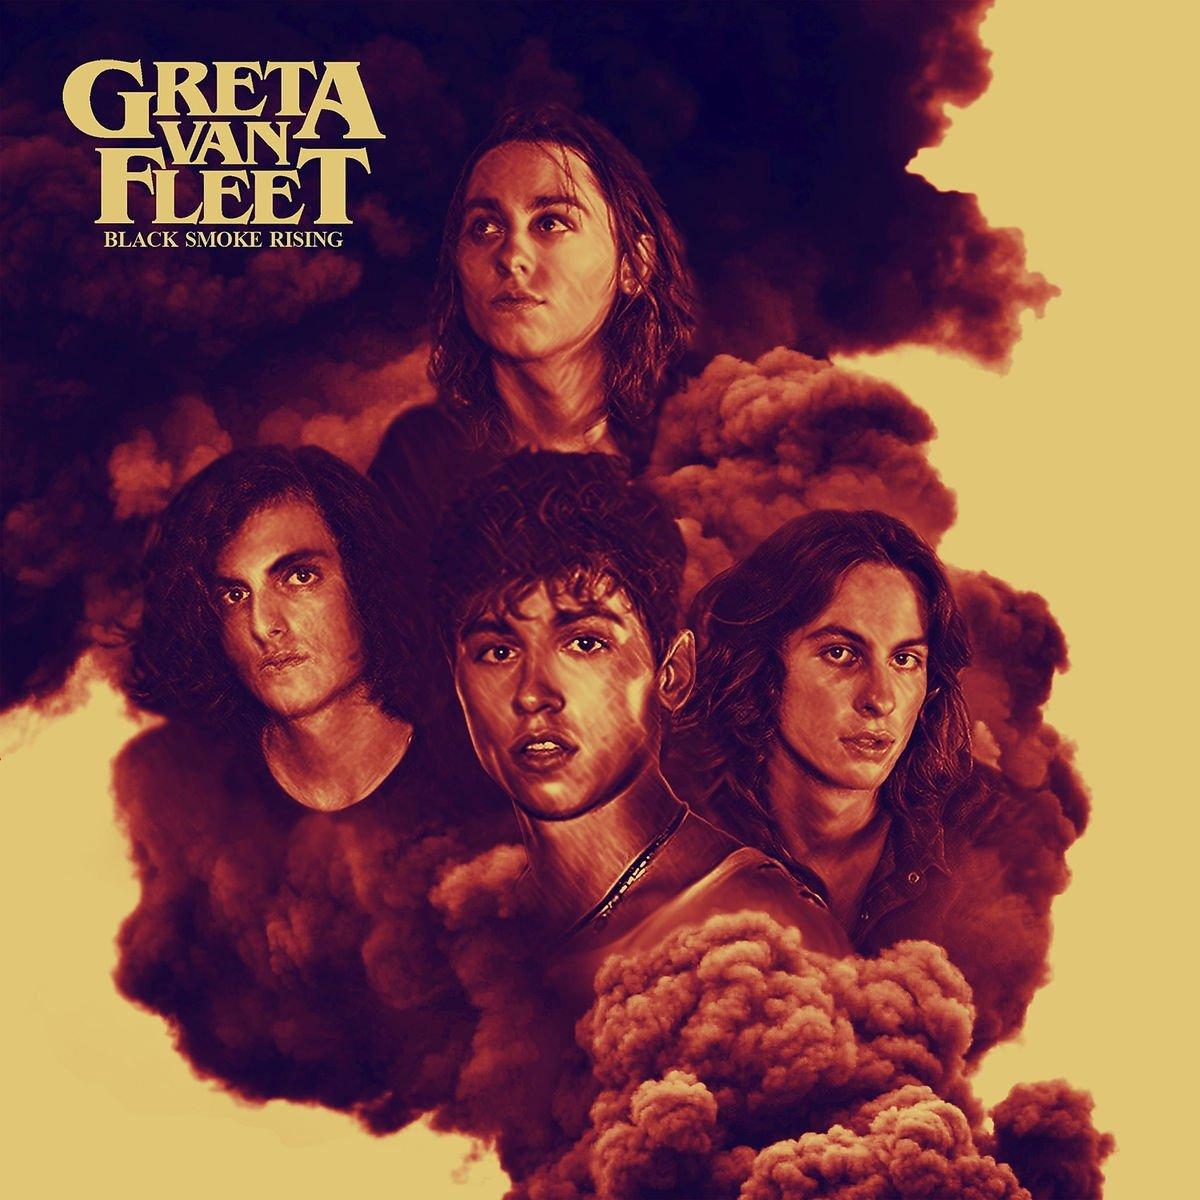 Greta Van Fleet - Black Smoke Rising (LP Vinyl)